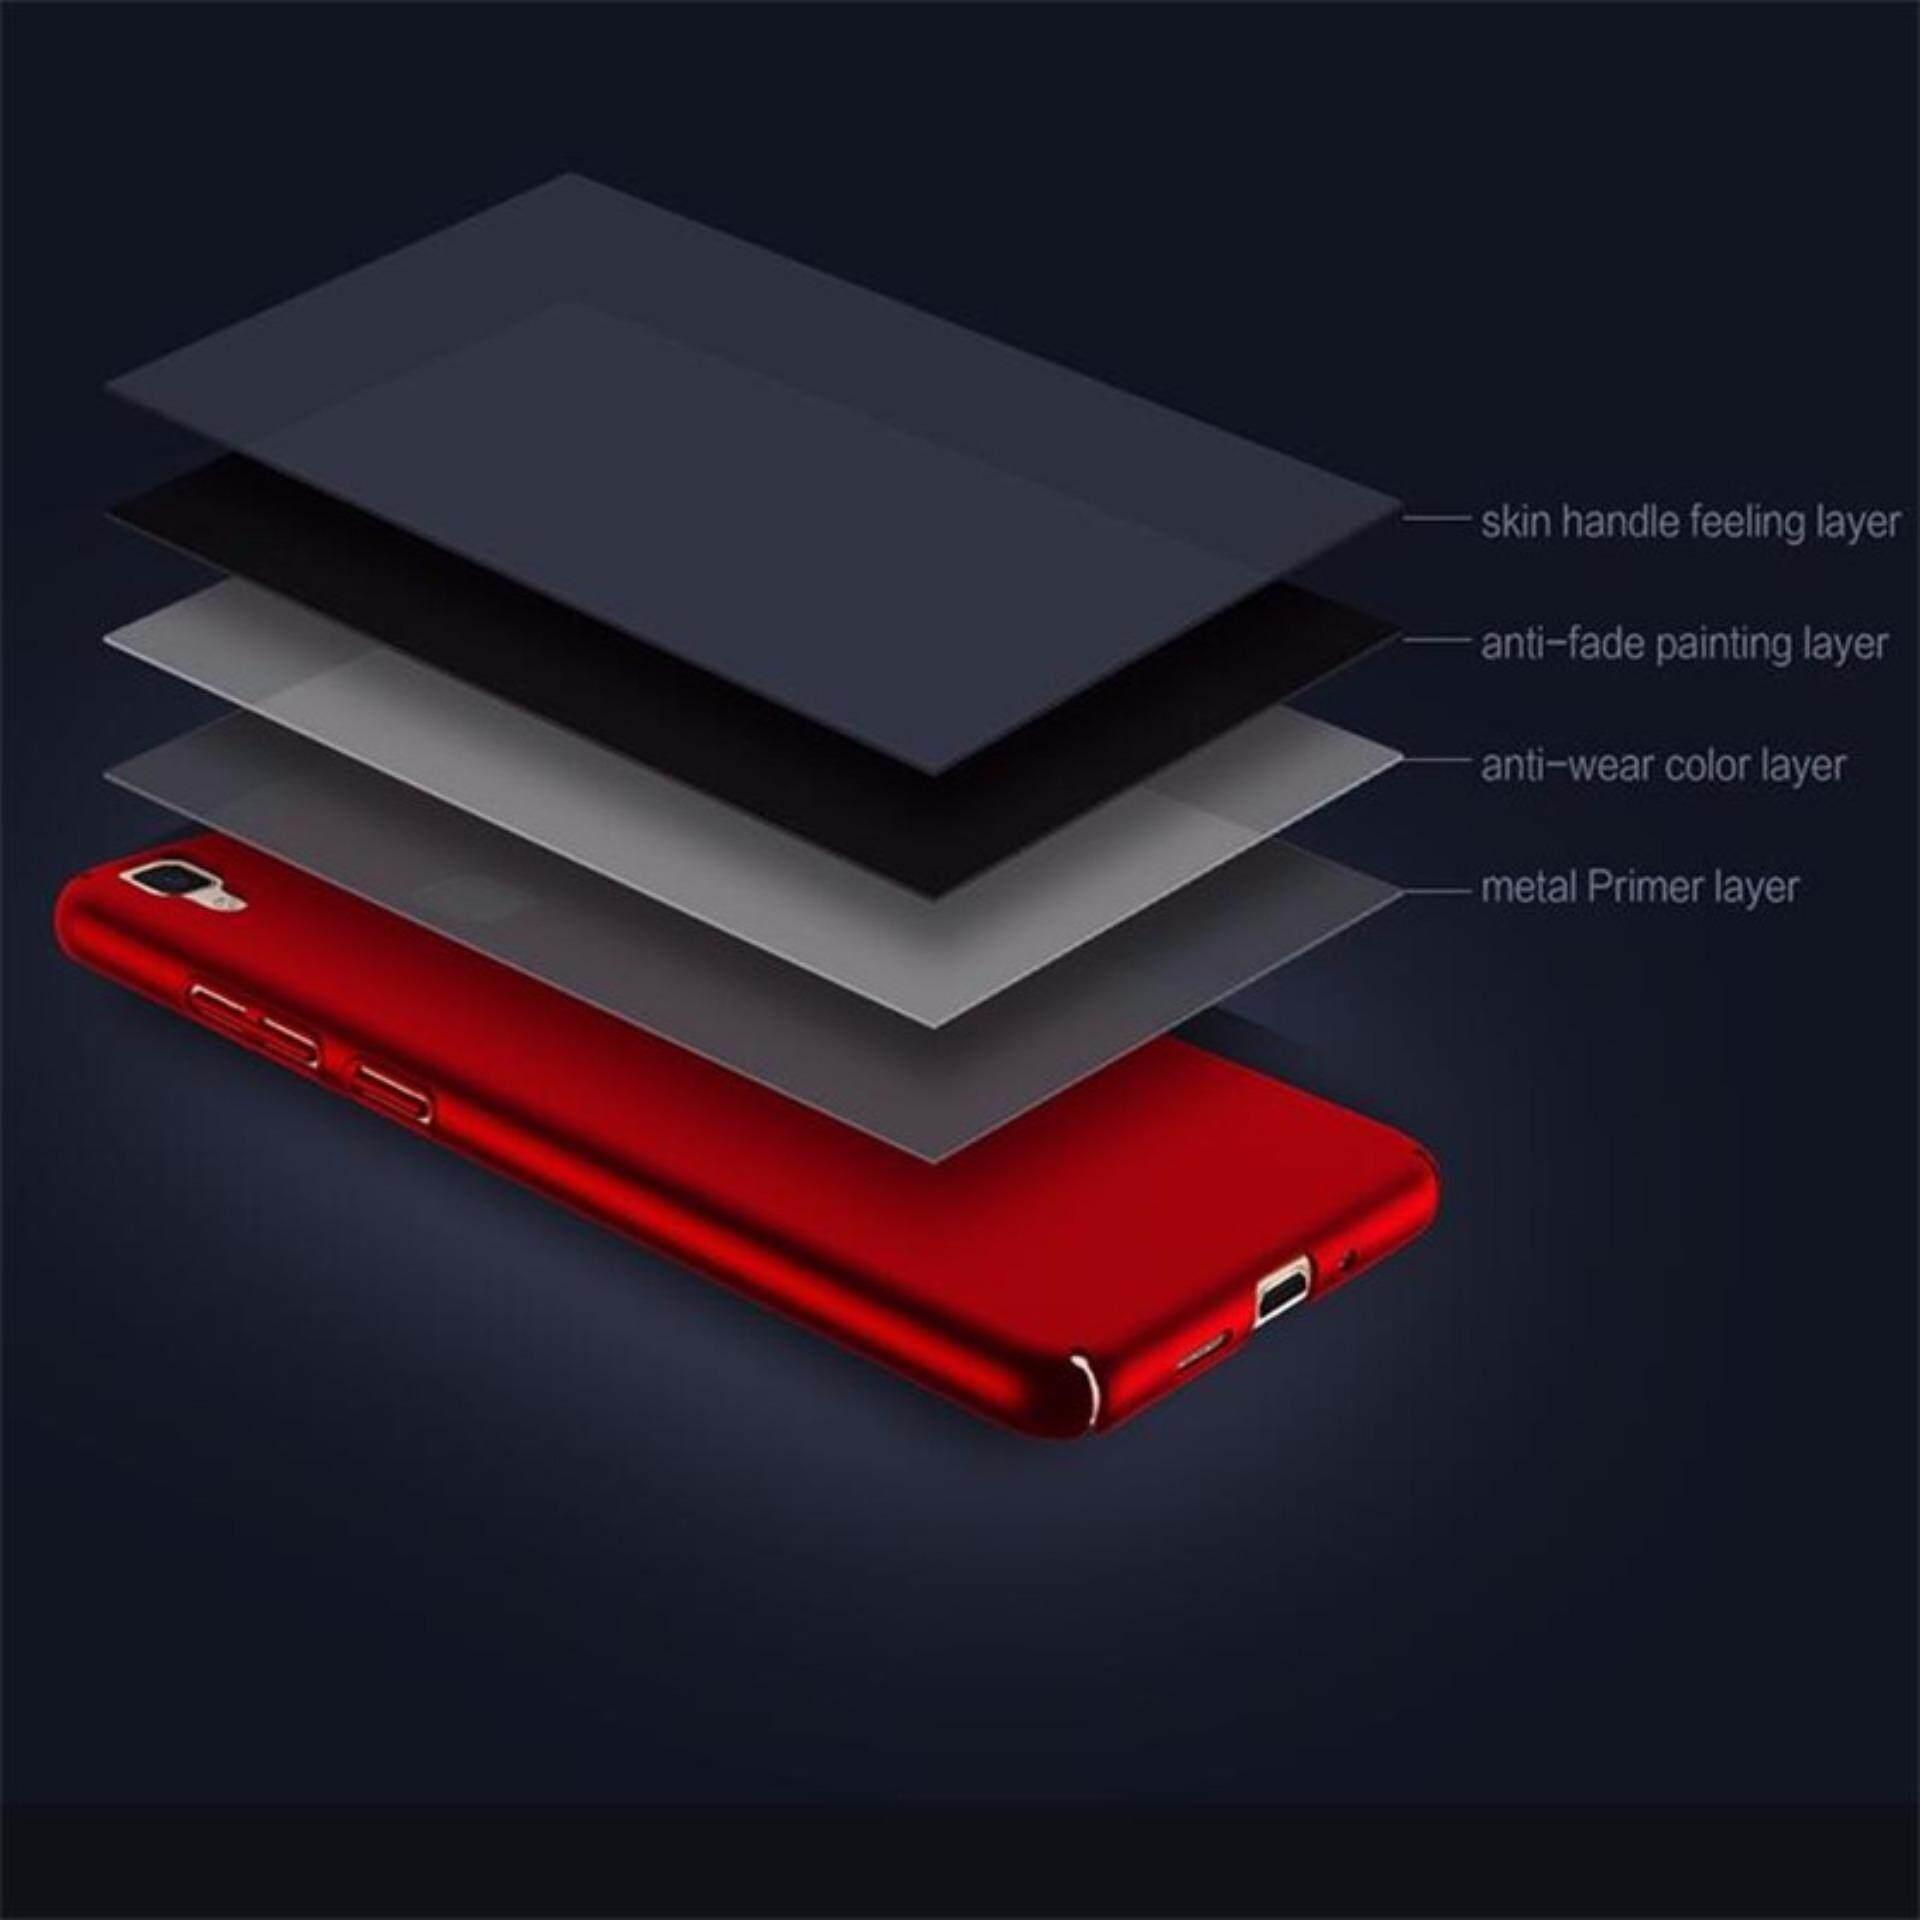 Ultra Tipis Kasus Menutupi Karet Silikon Mate Lembut Untuk Apple Ibacks Acta Royal For Iphone 7 Plus Hitam Super Keras Melindungi Pc Sangat Vivo V3 Scrub Telepon